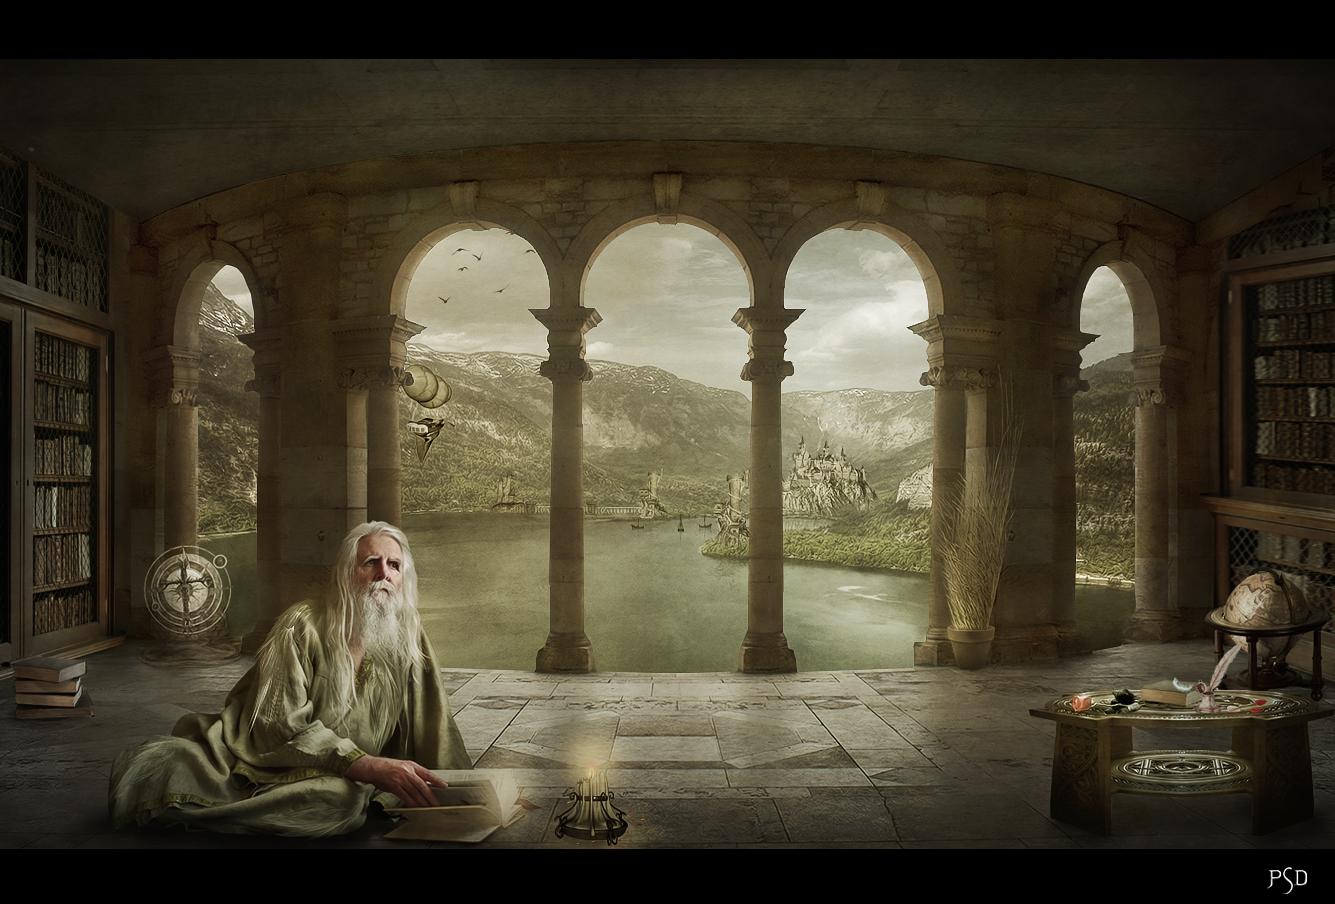 Le refuge du Poete by ThyC-Graphics